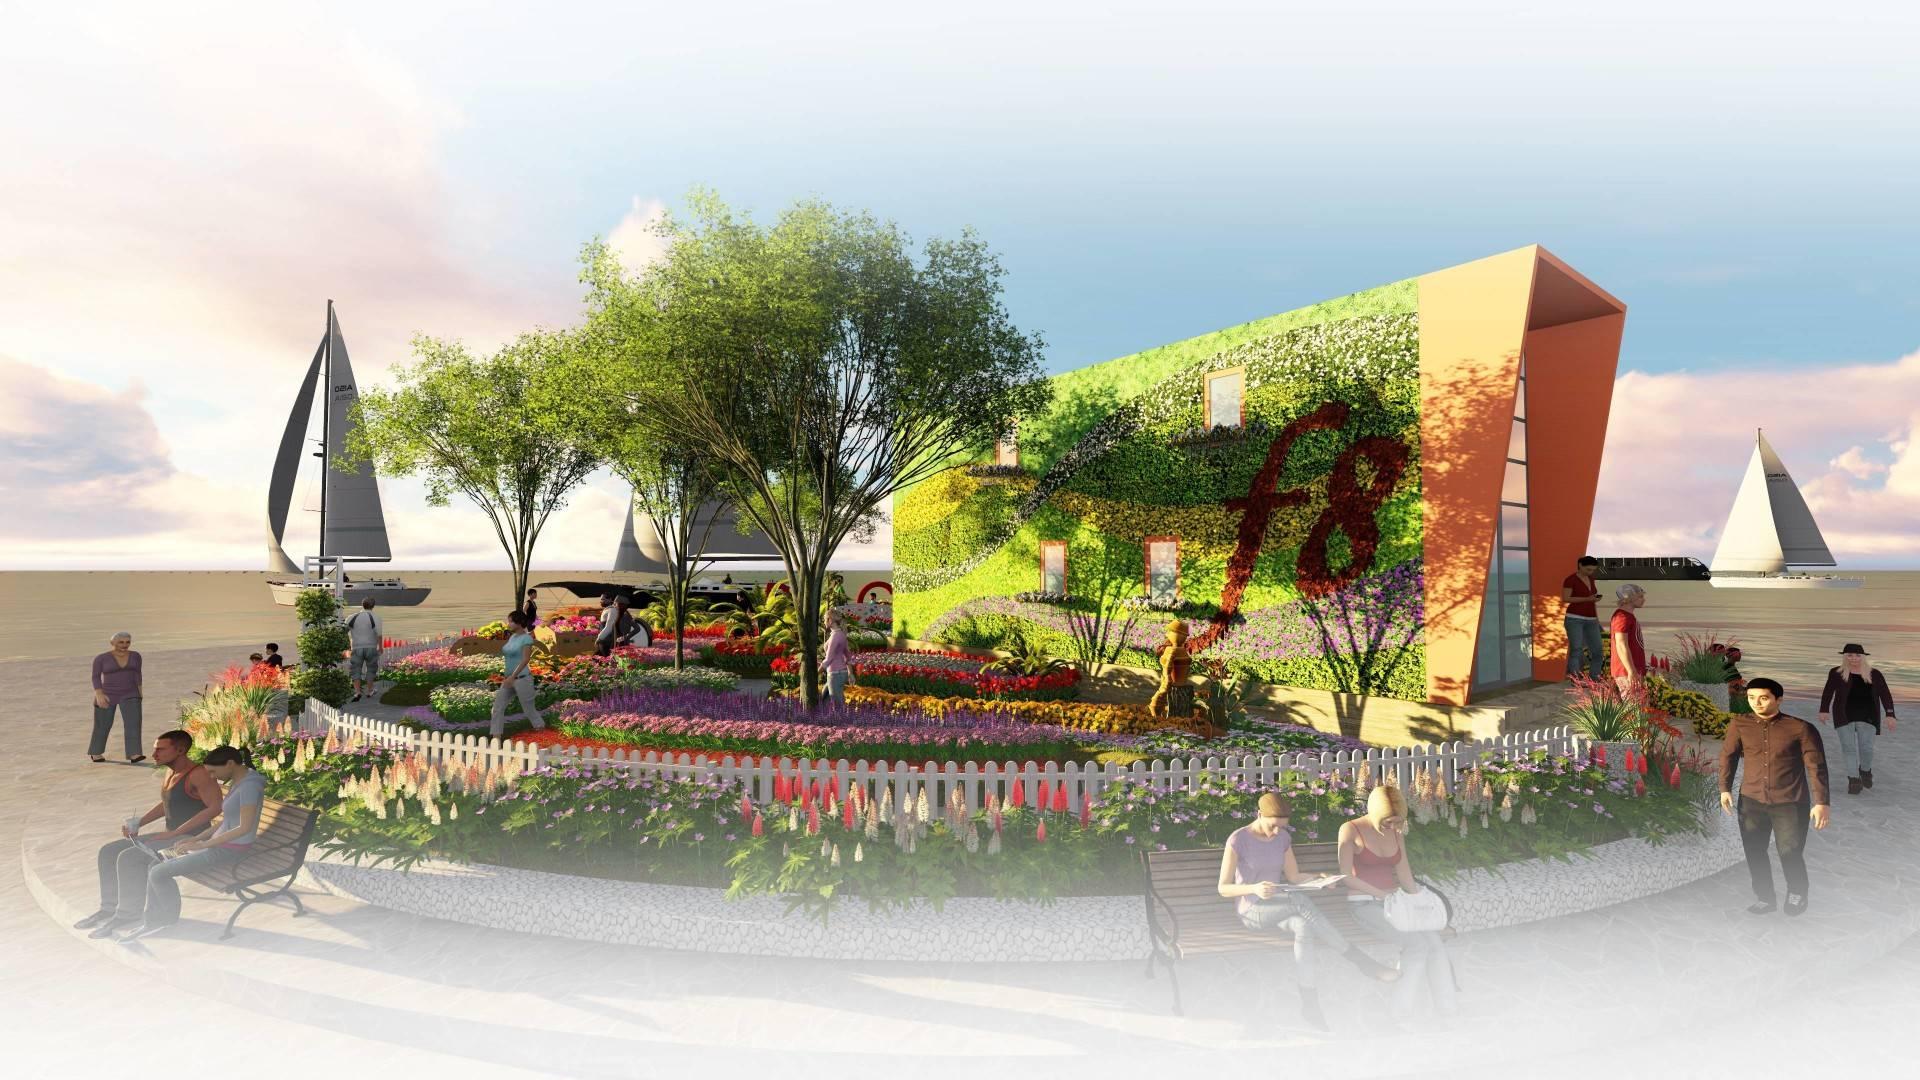 Miv Architects (Ar. Muhammad Ikhsan Hamiru, Iai & Partners) Design Of Flower Art Zone For Makassar International Eight Festival (September 8-10 2016) At Losari Beach, Makassar City, Indonesia Makassar, Sulawesi Selatan, Indonesia Makassar, Sulawesi Selatan, Indonesia Photo-6161 Tropis  6161